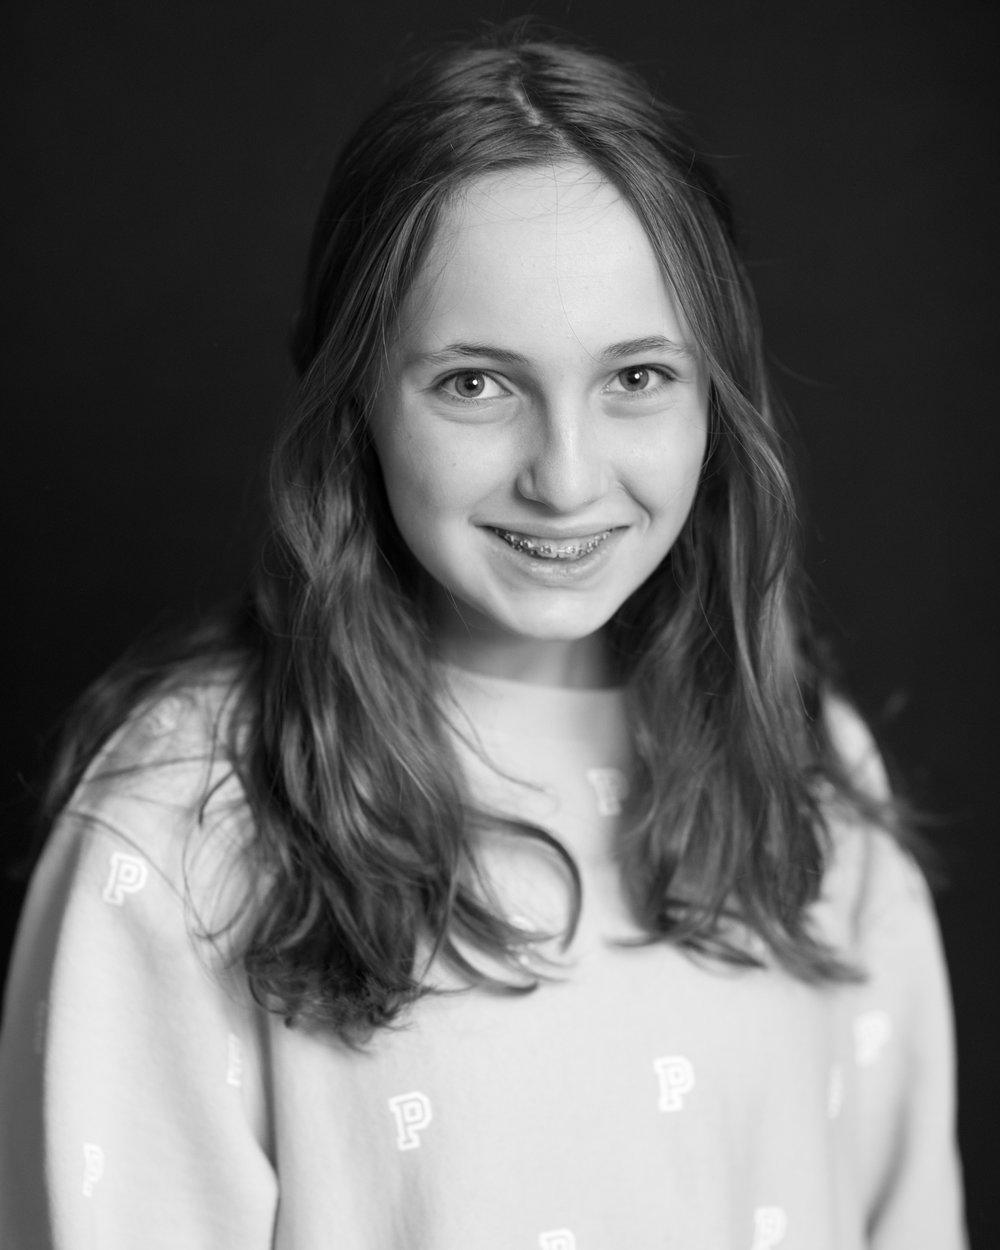 Kate Feldman